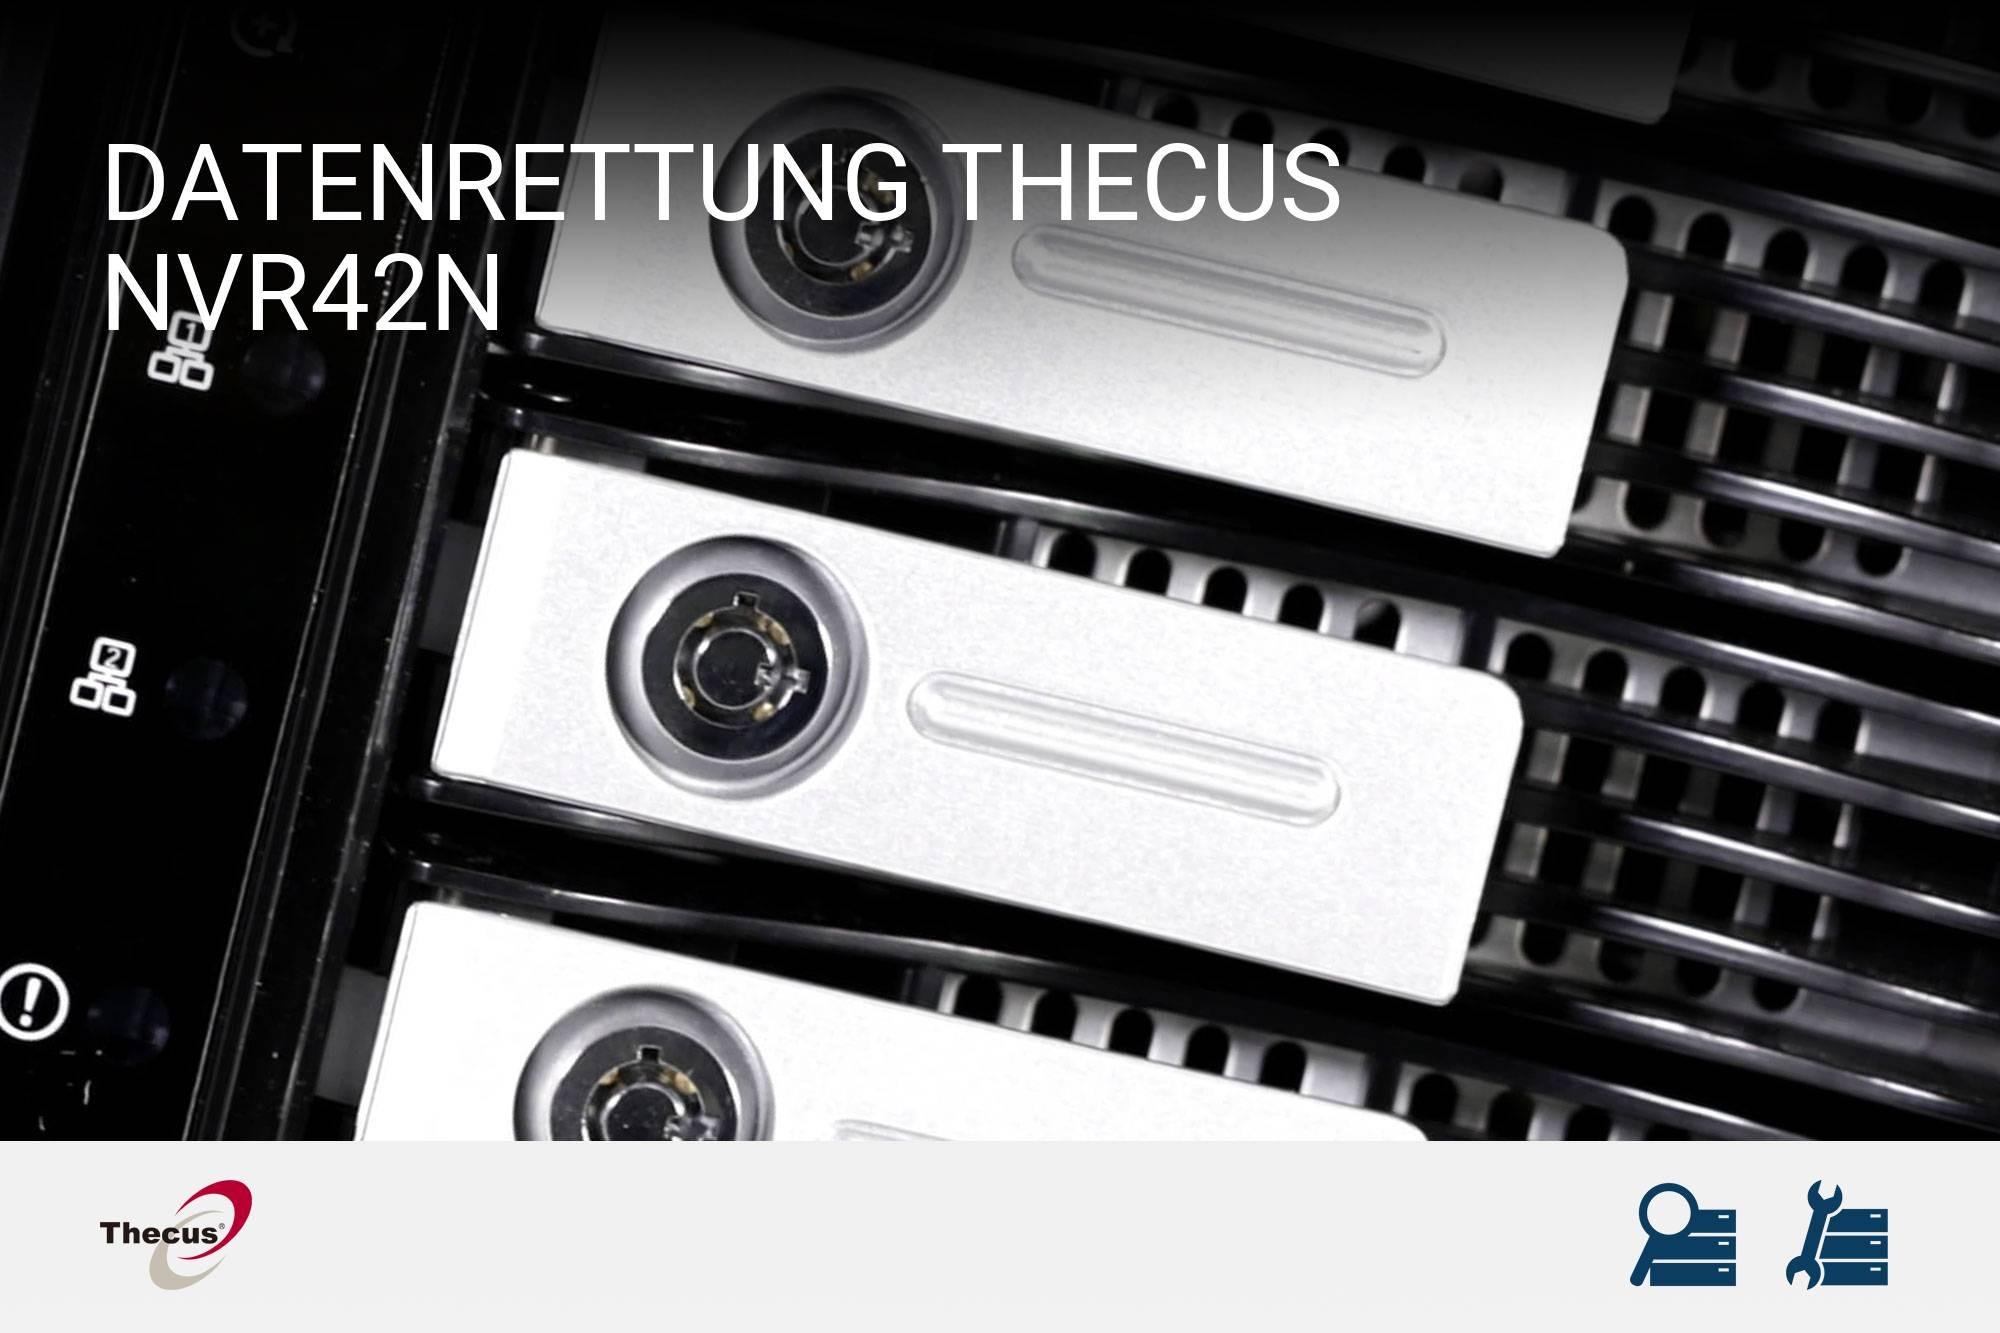 Thecus NVR42N